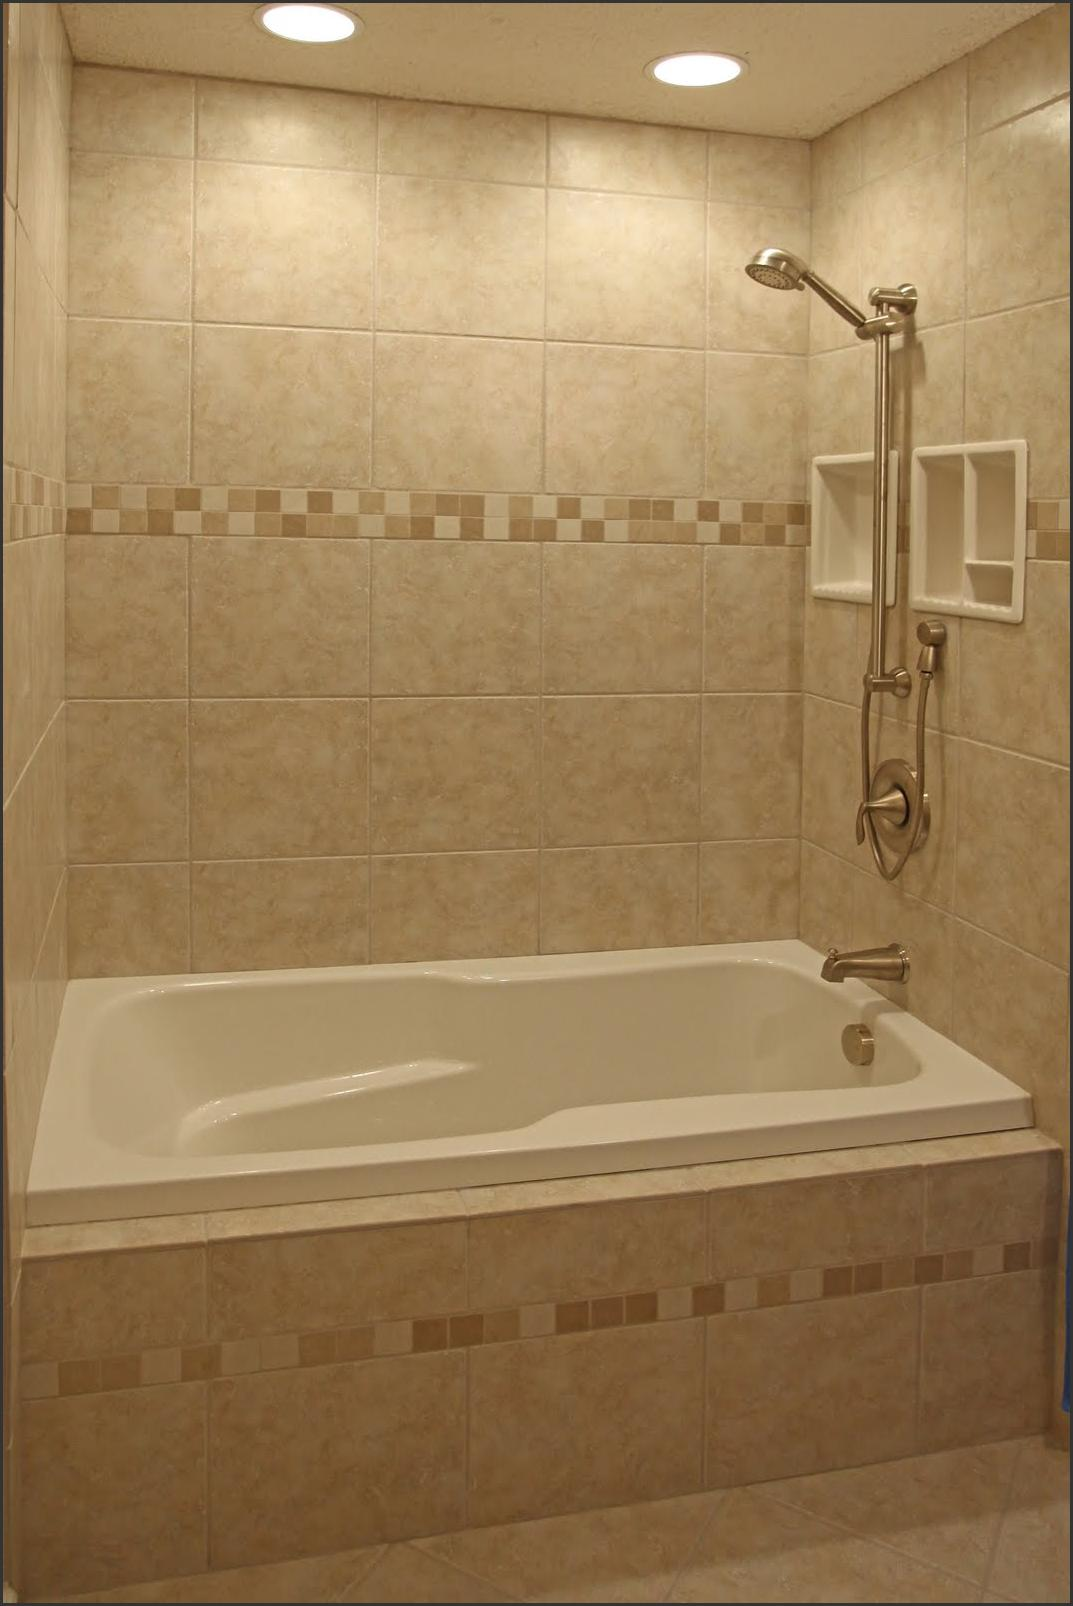 Tile Bathroom Shower Design Ideas Ceramic Tile Bathroom bathroom ...